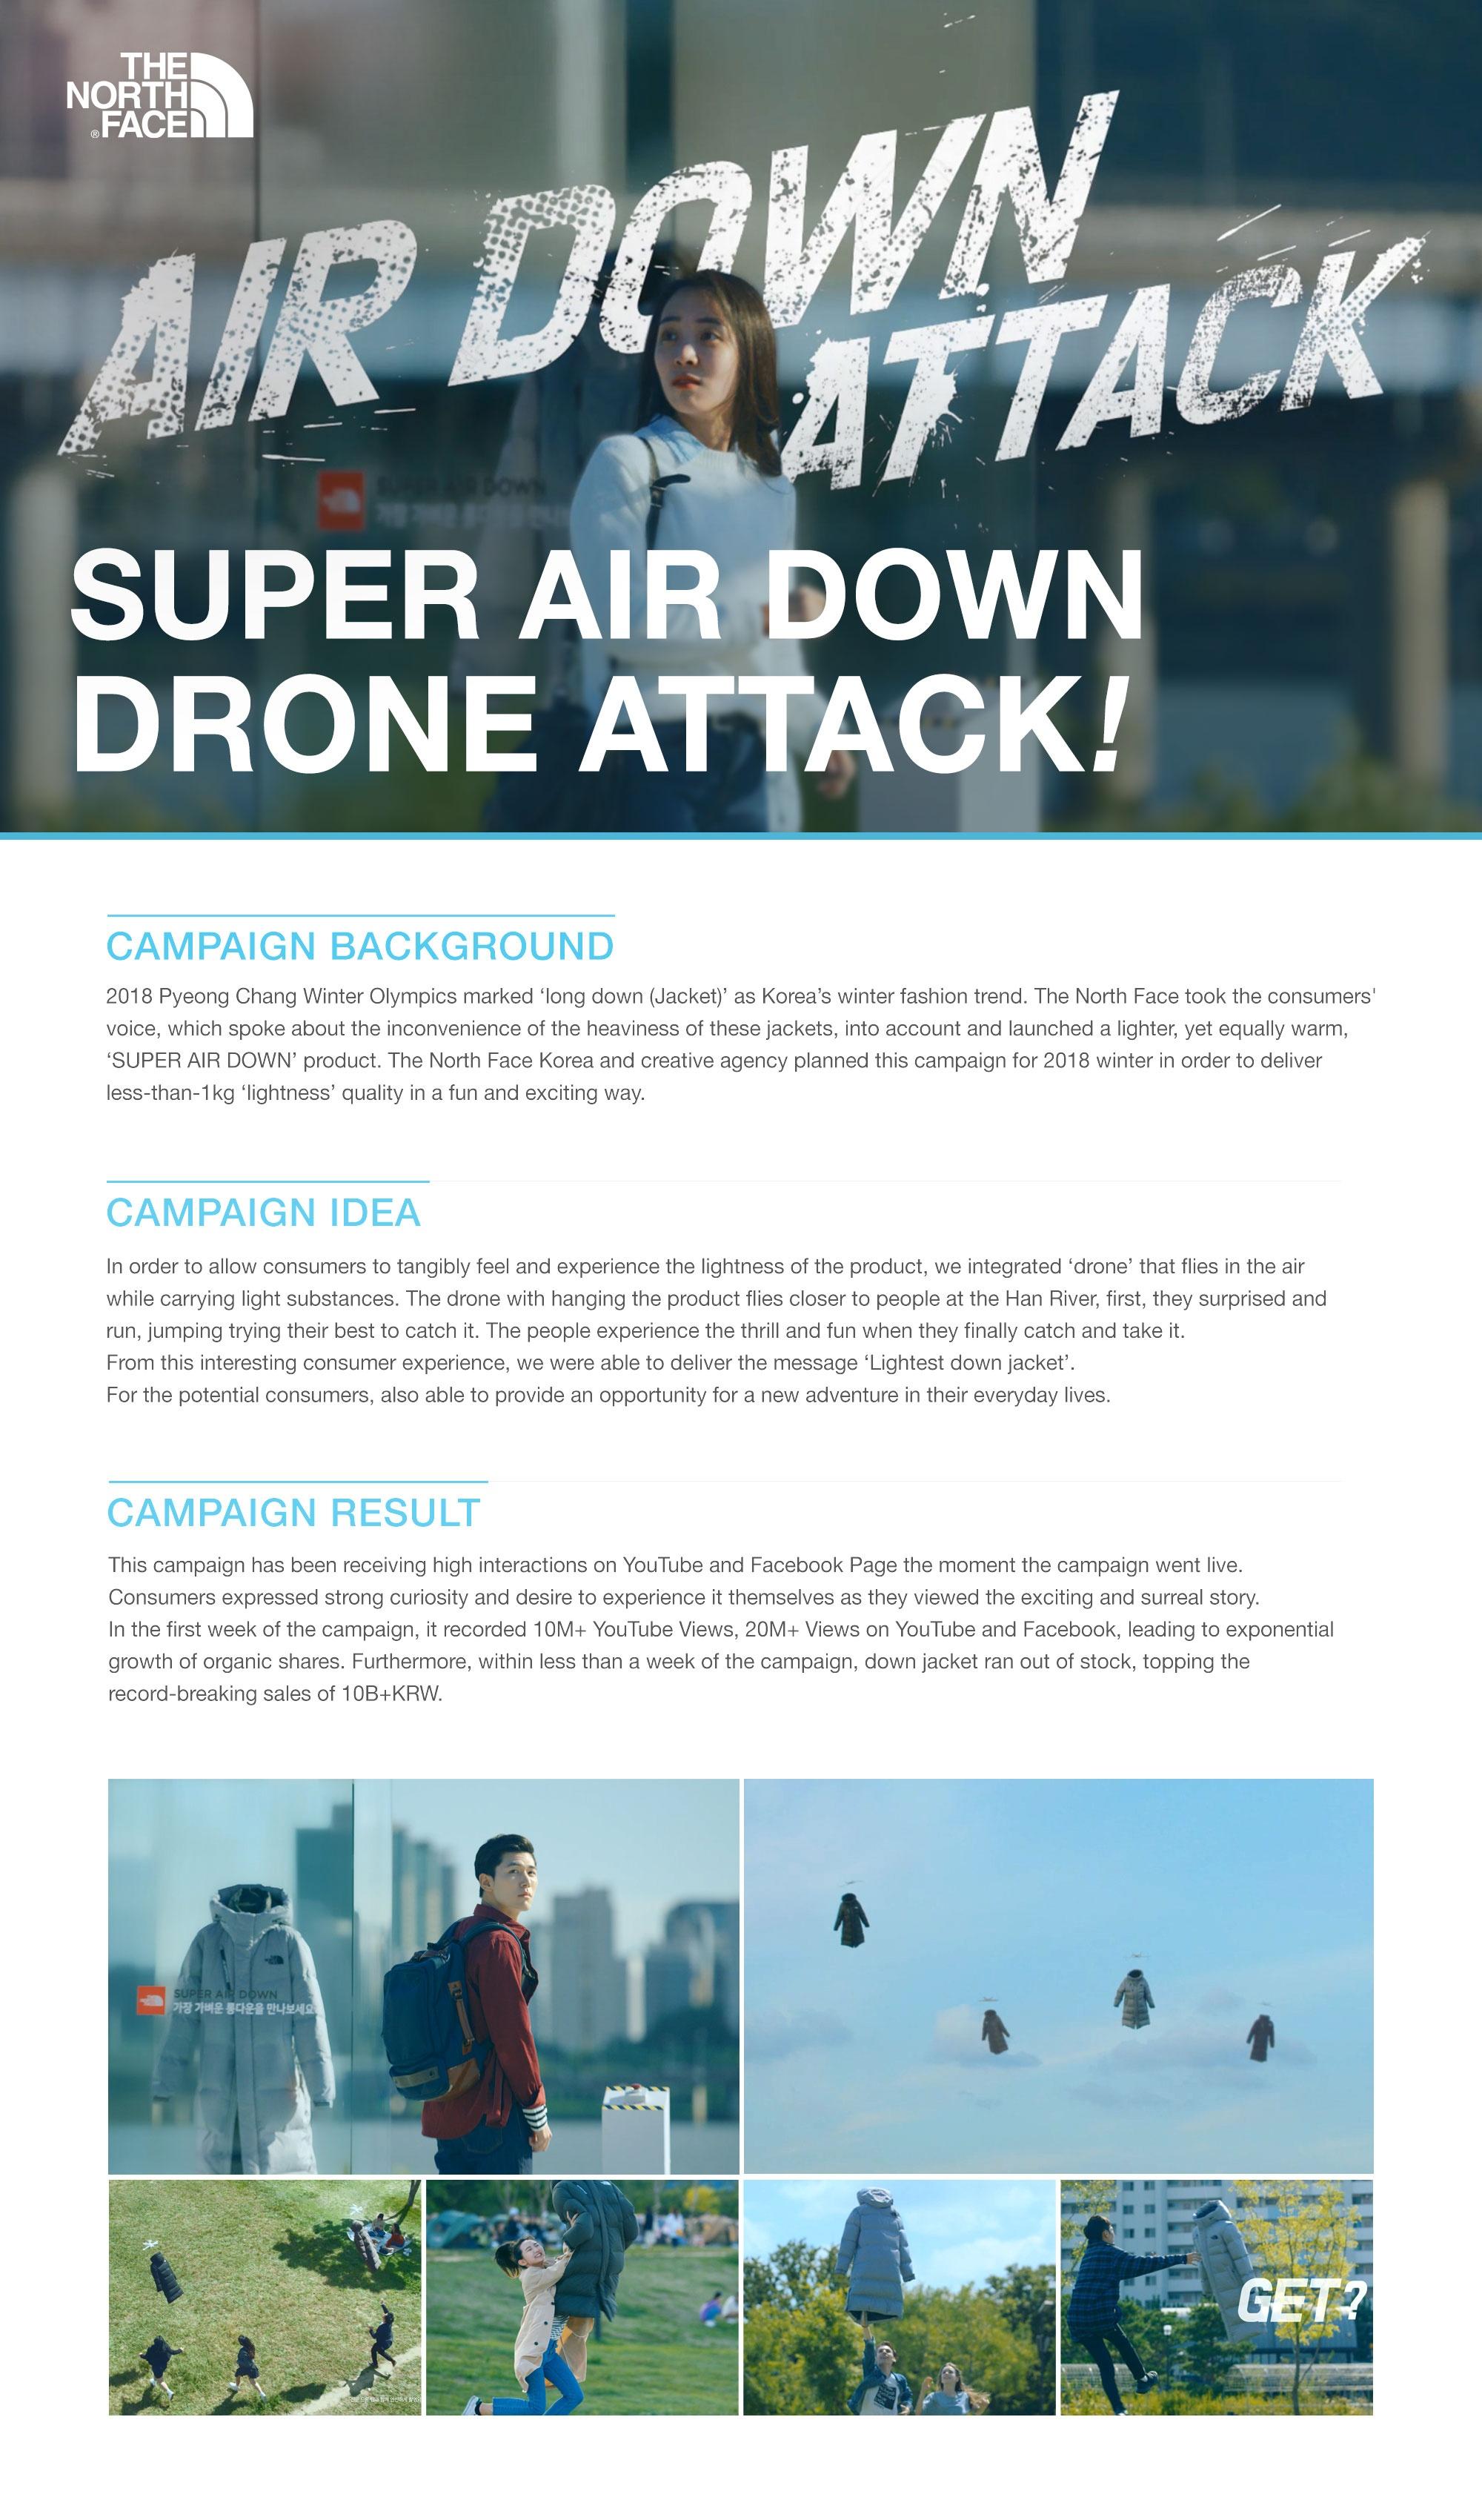 Thumbnail for Super Air Down Drone Attack